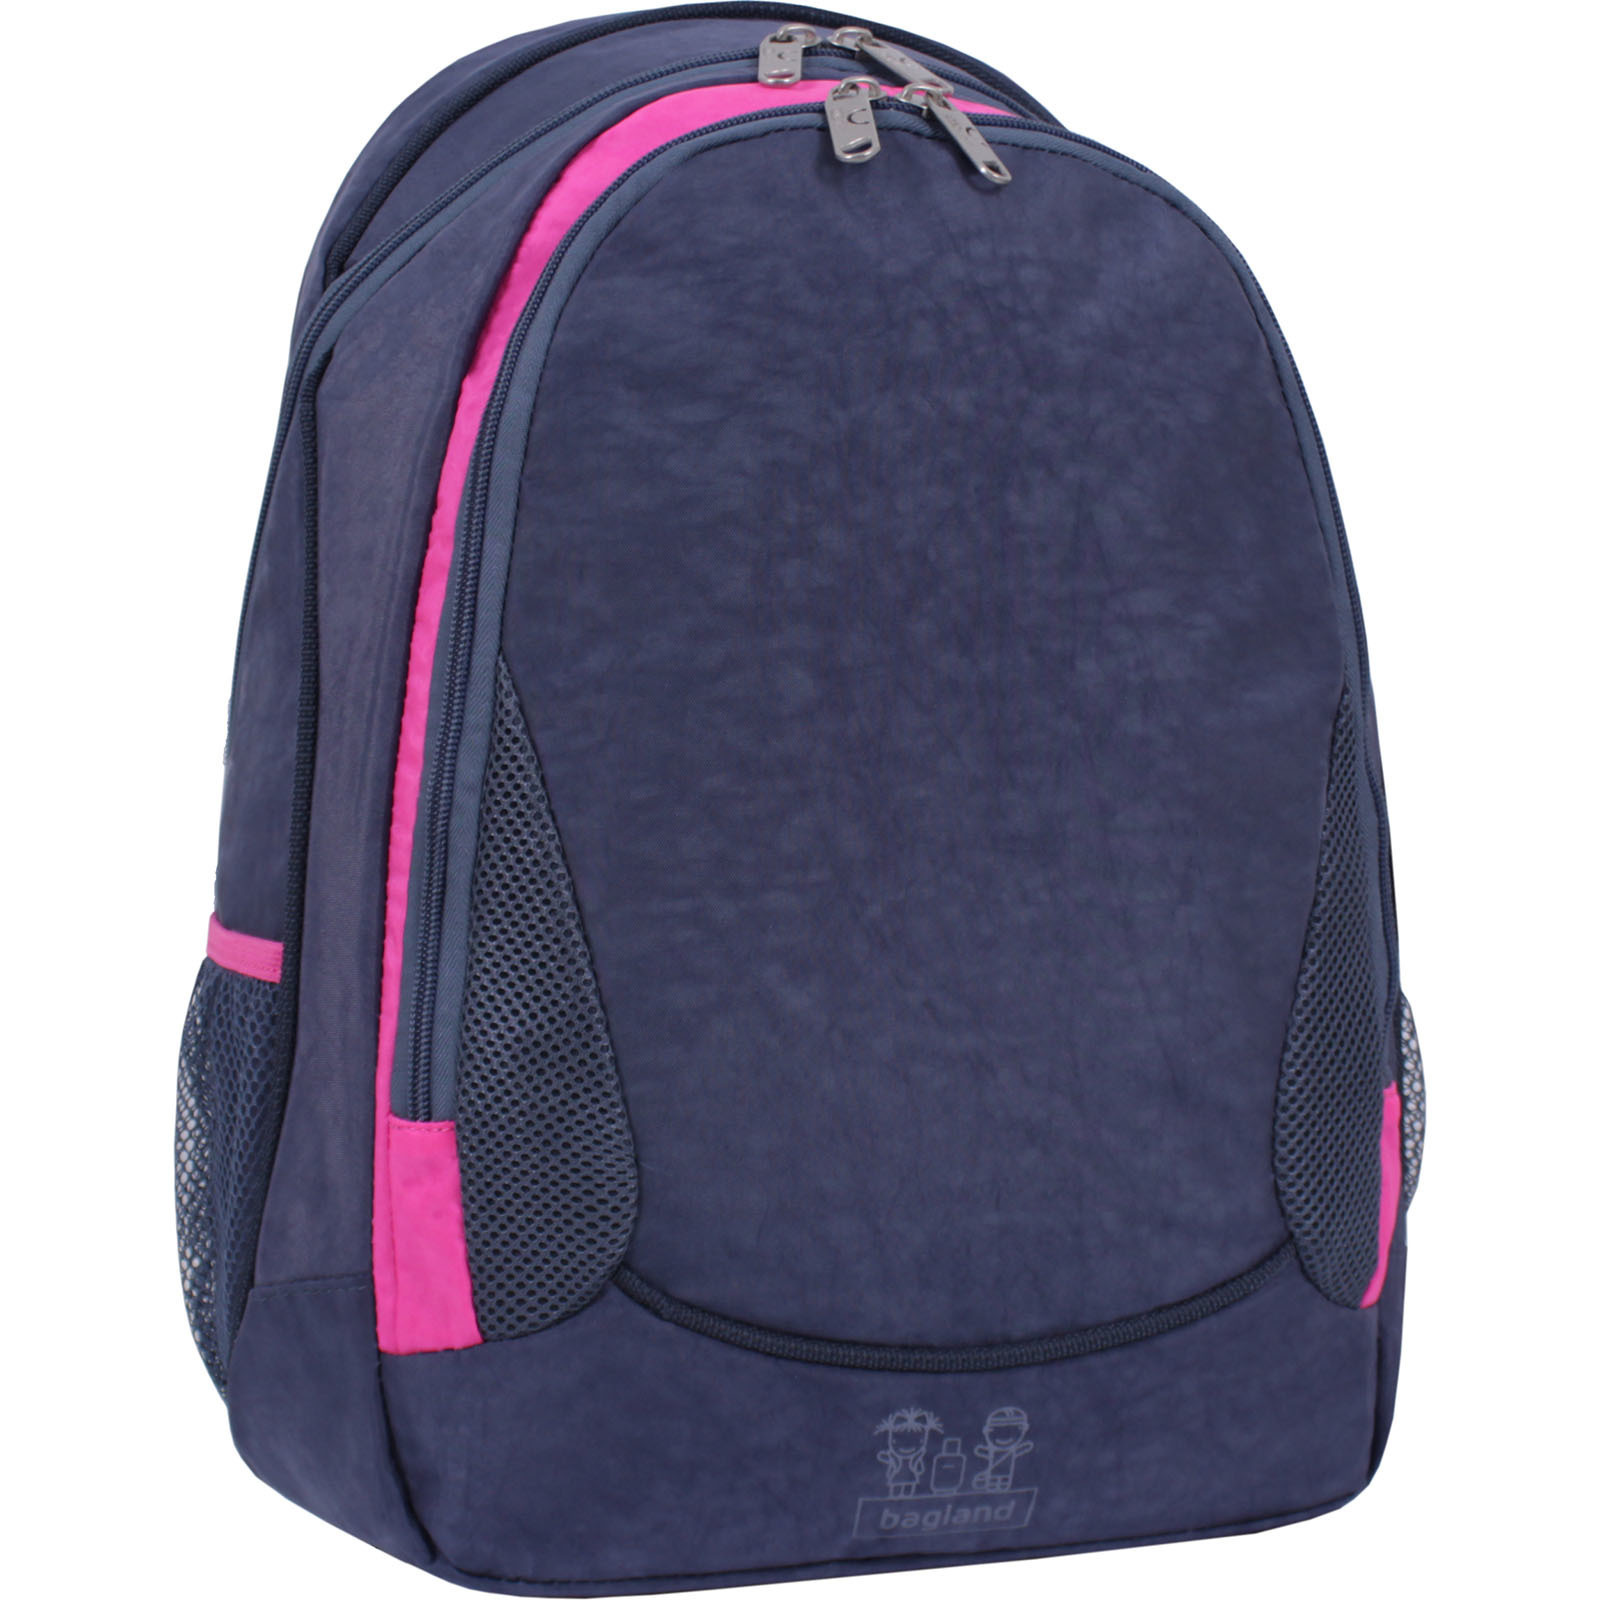 Женские рюкзаки Рюкзак Bagland Ураган 20 л. Серый/розовый (0057470) IMG_8930.JPG